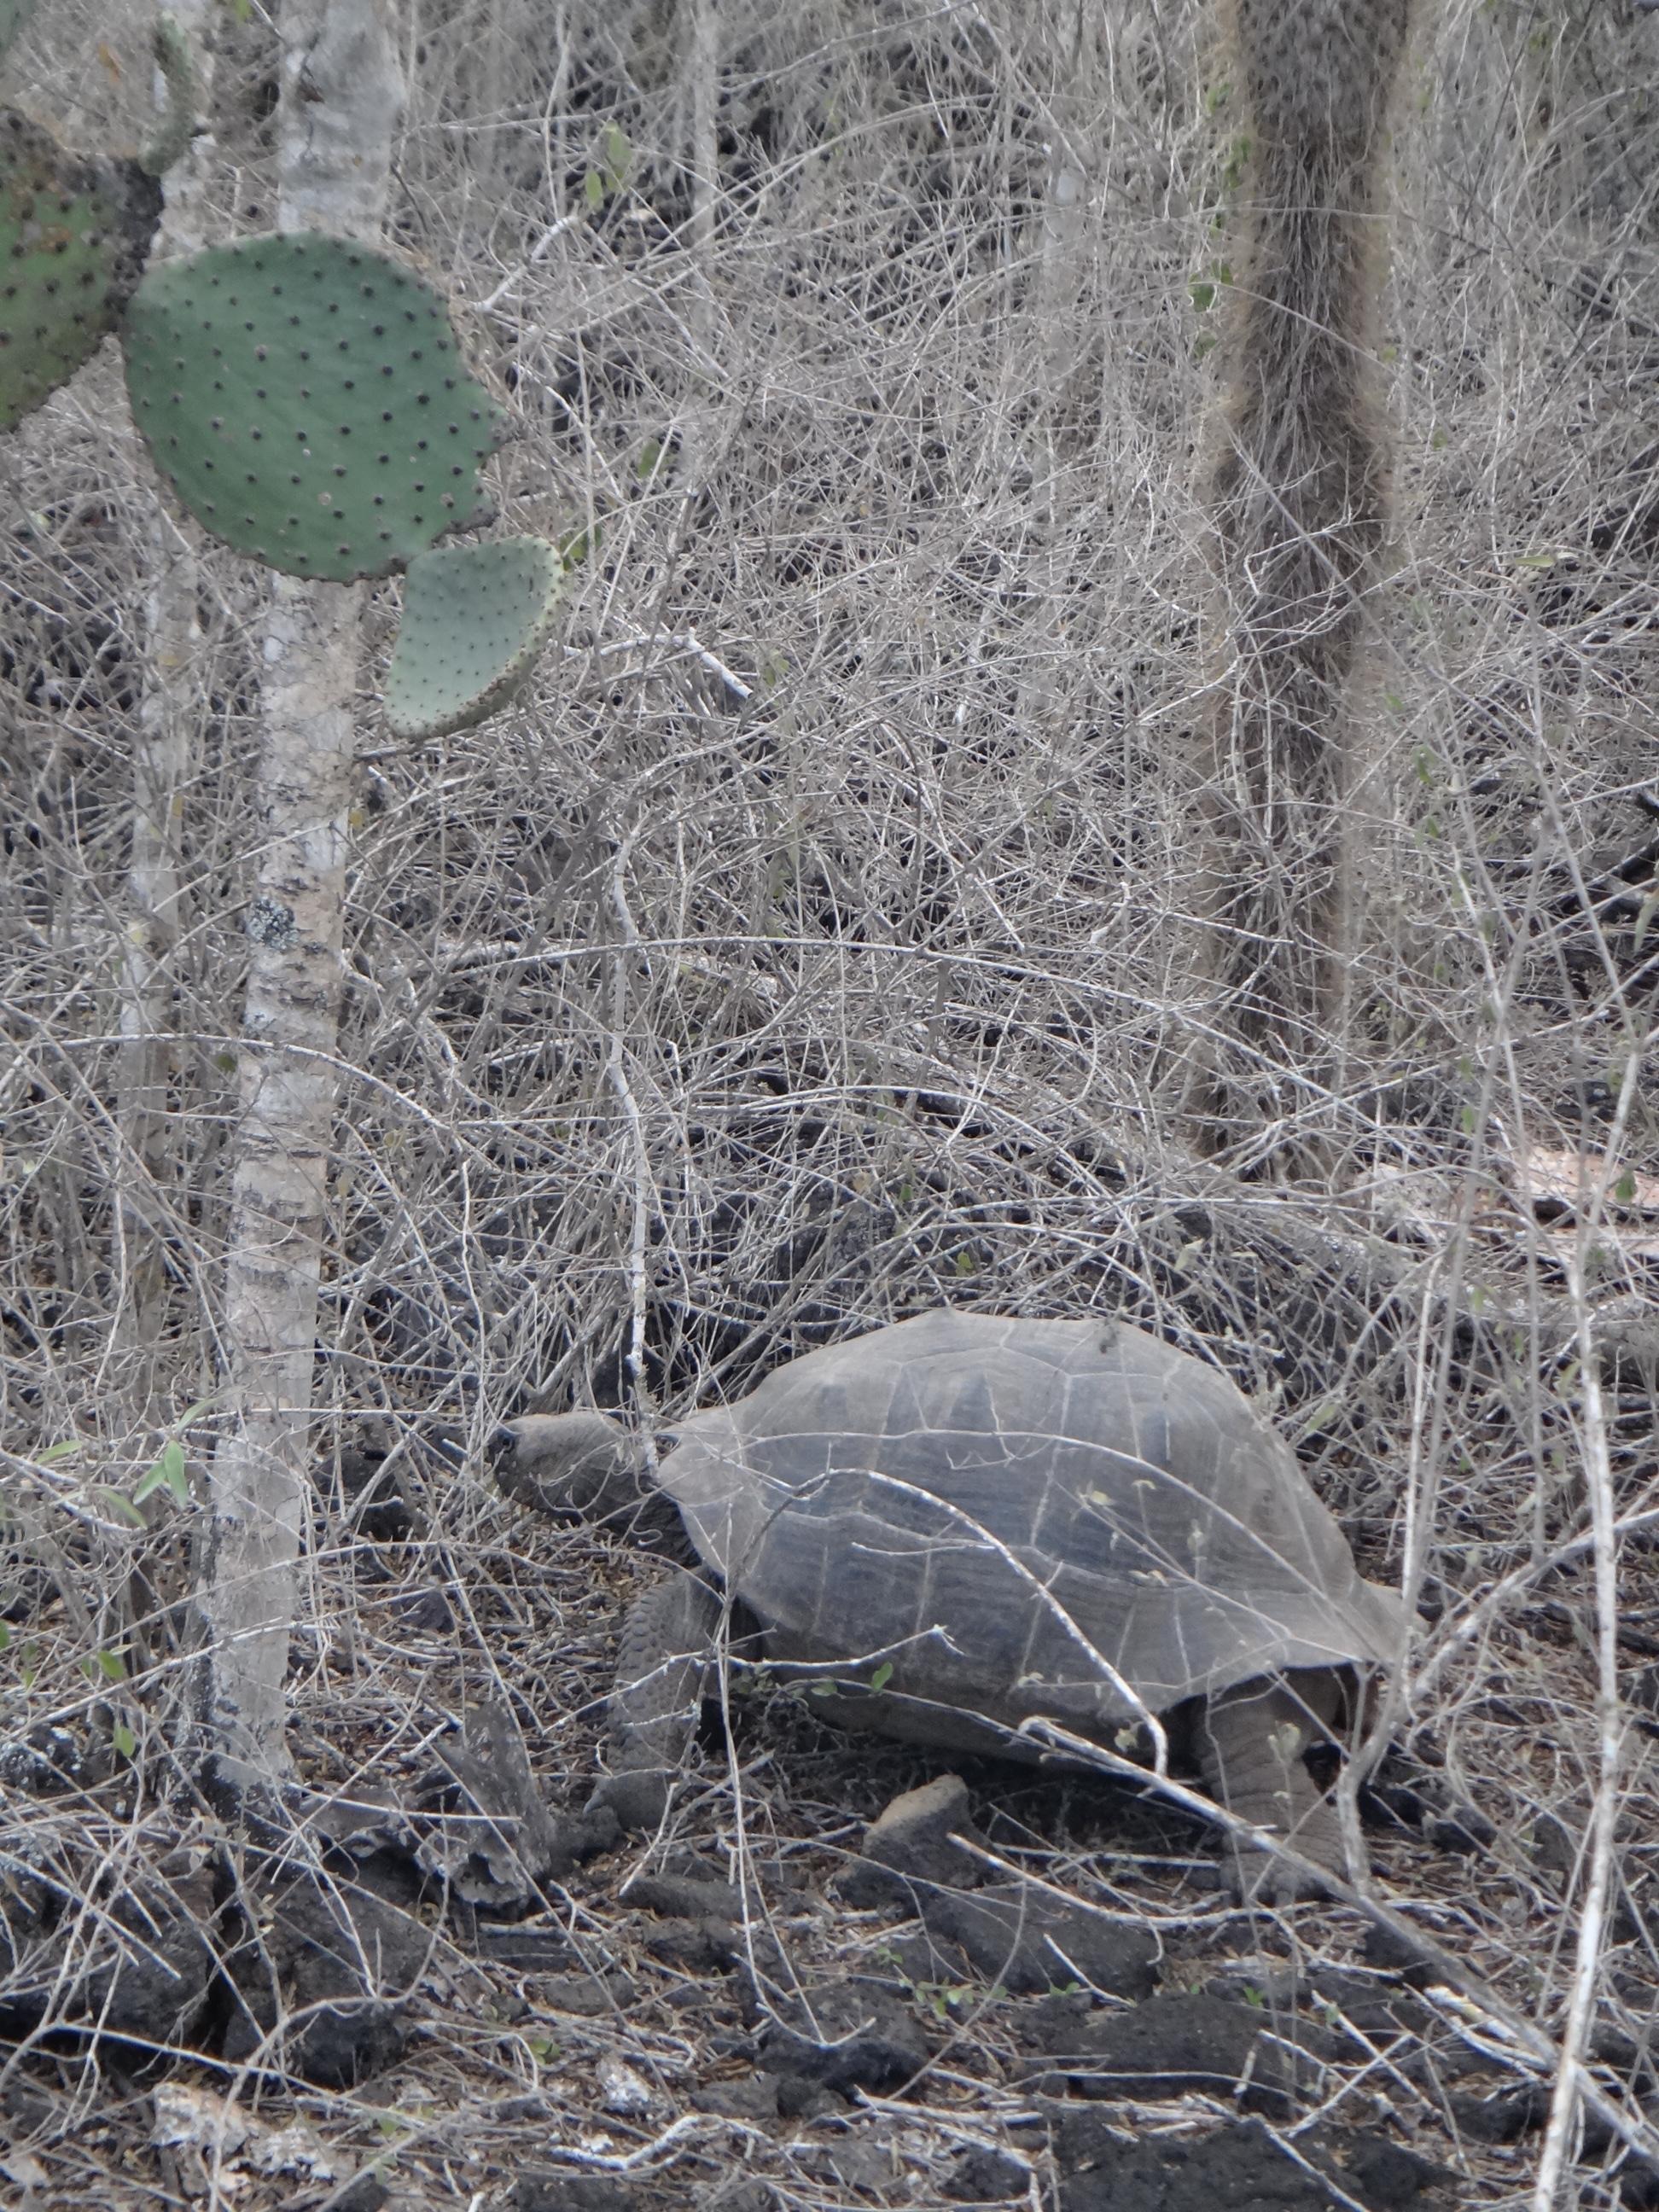 Ecuador_Galapagos Islands_Isla Isabela_Parque Nacional Galapagos near Purto Villamil_Giant Land Tortoise